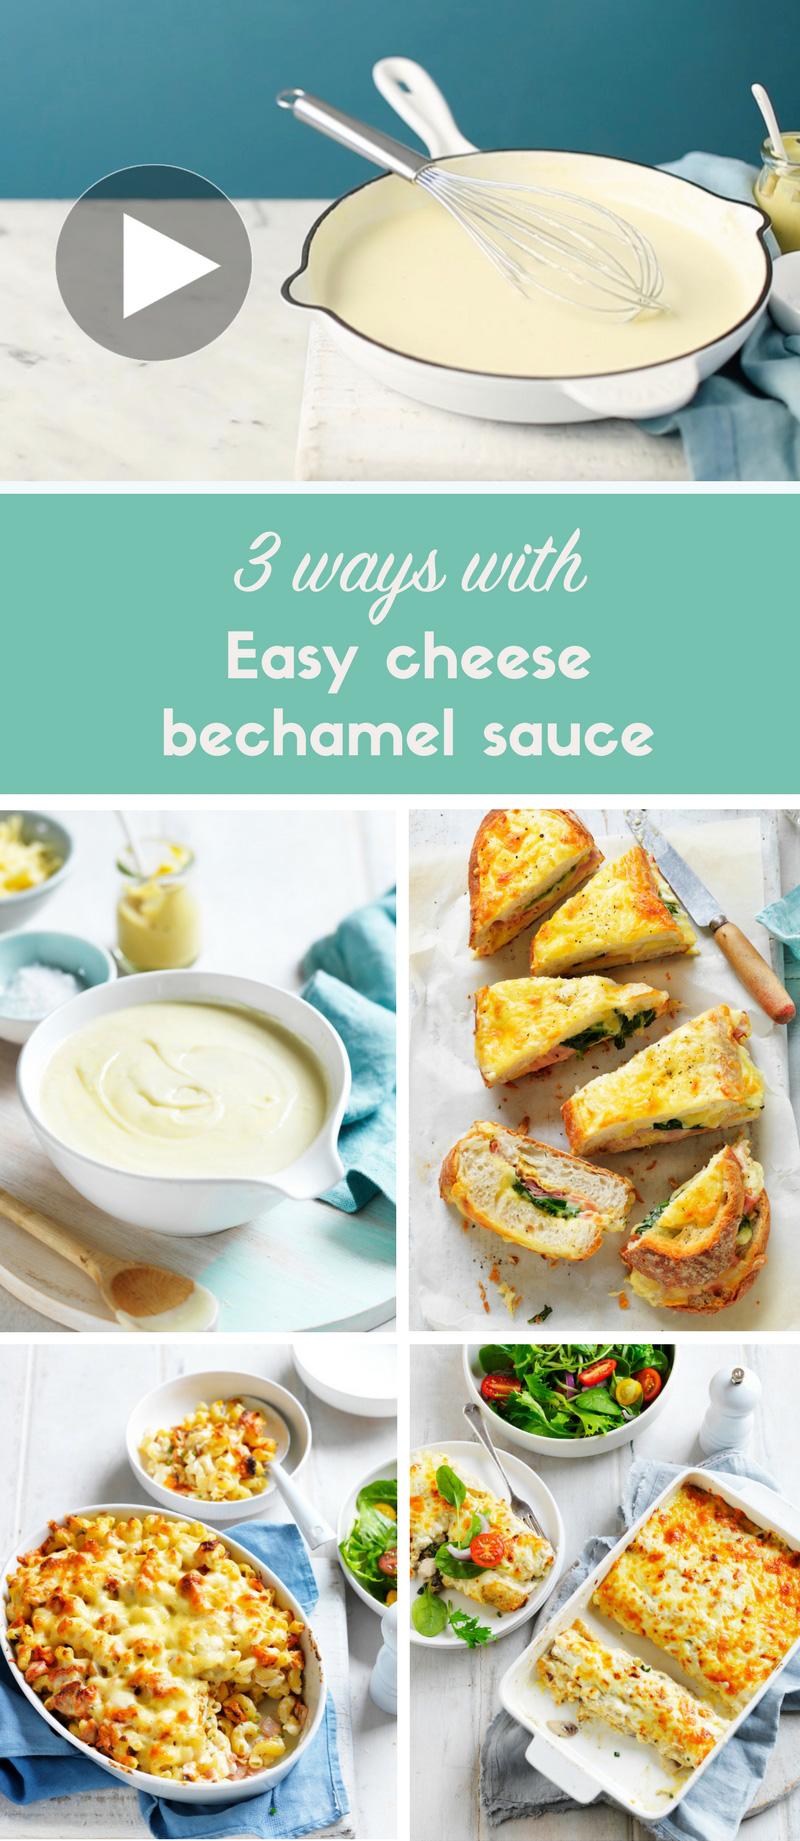 3 ways to use a béchamel sauce recipe